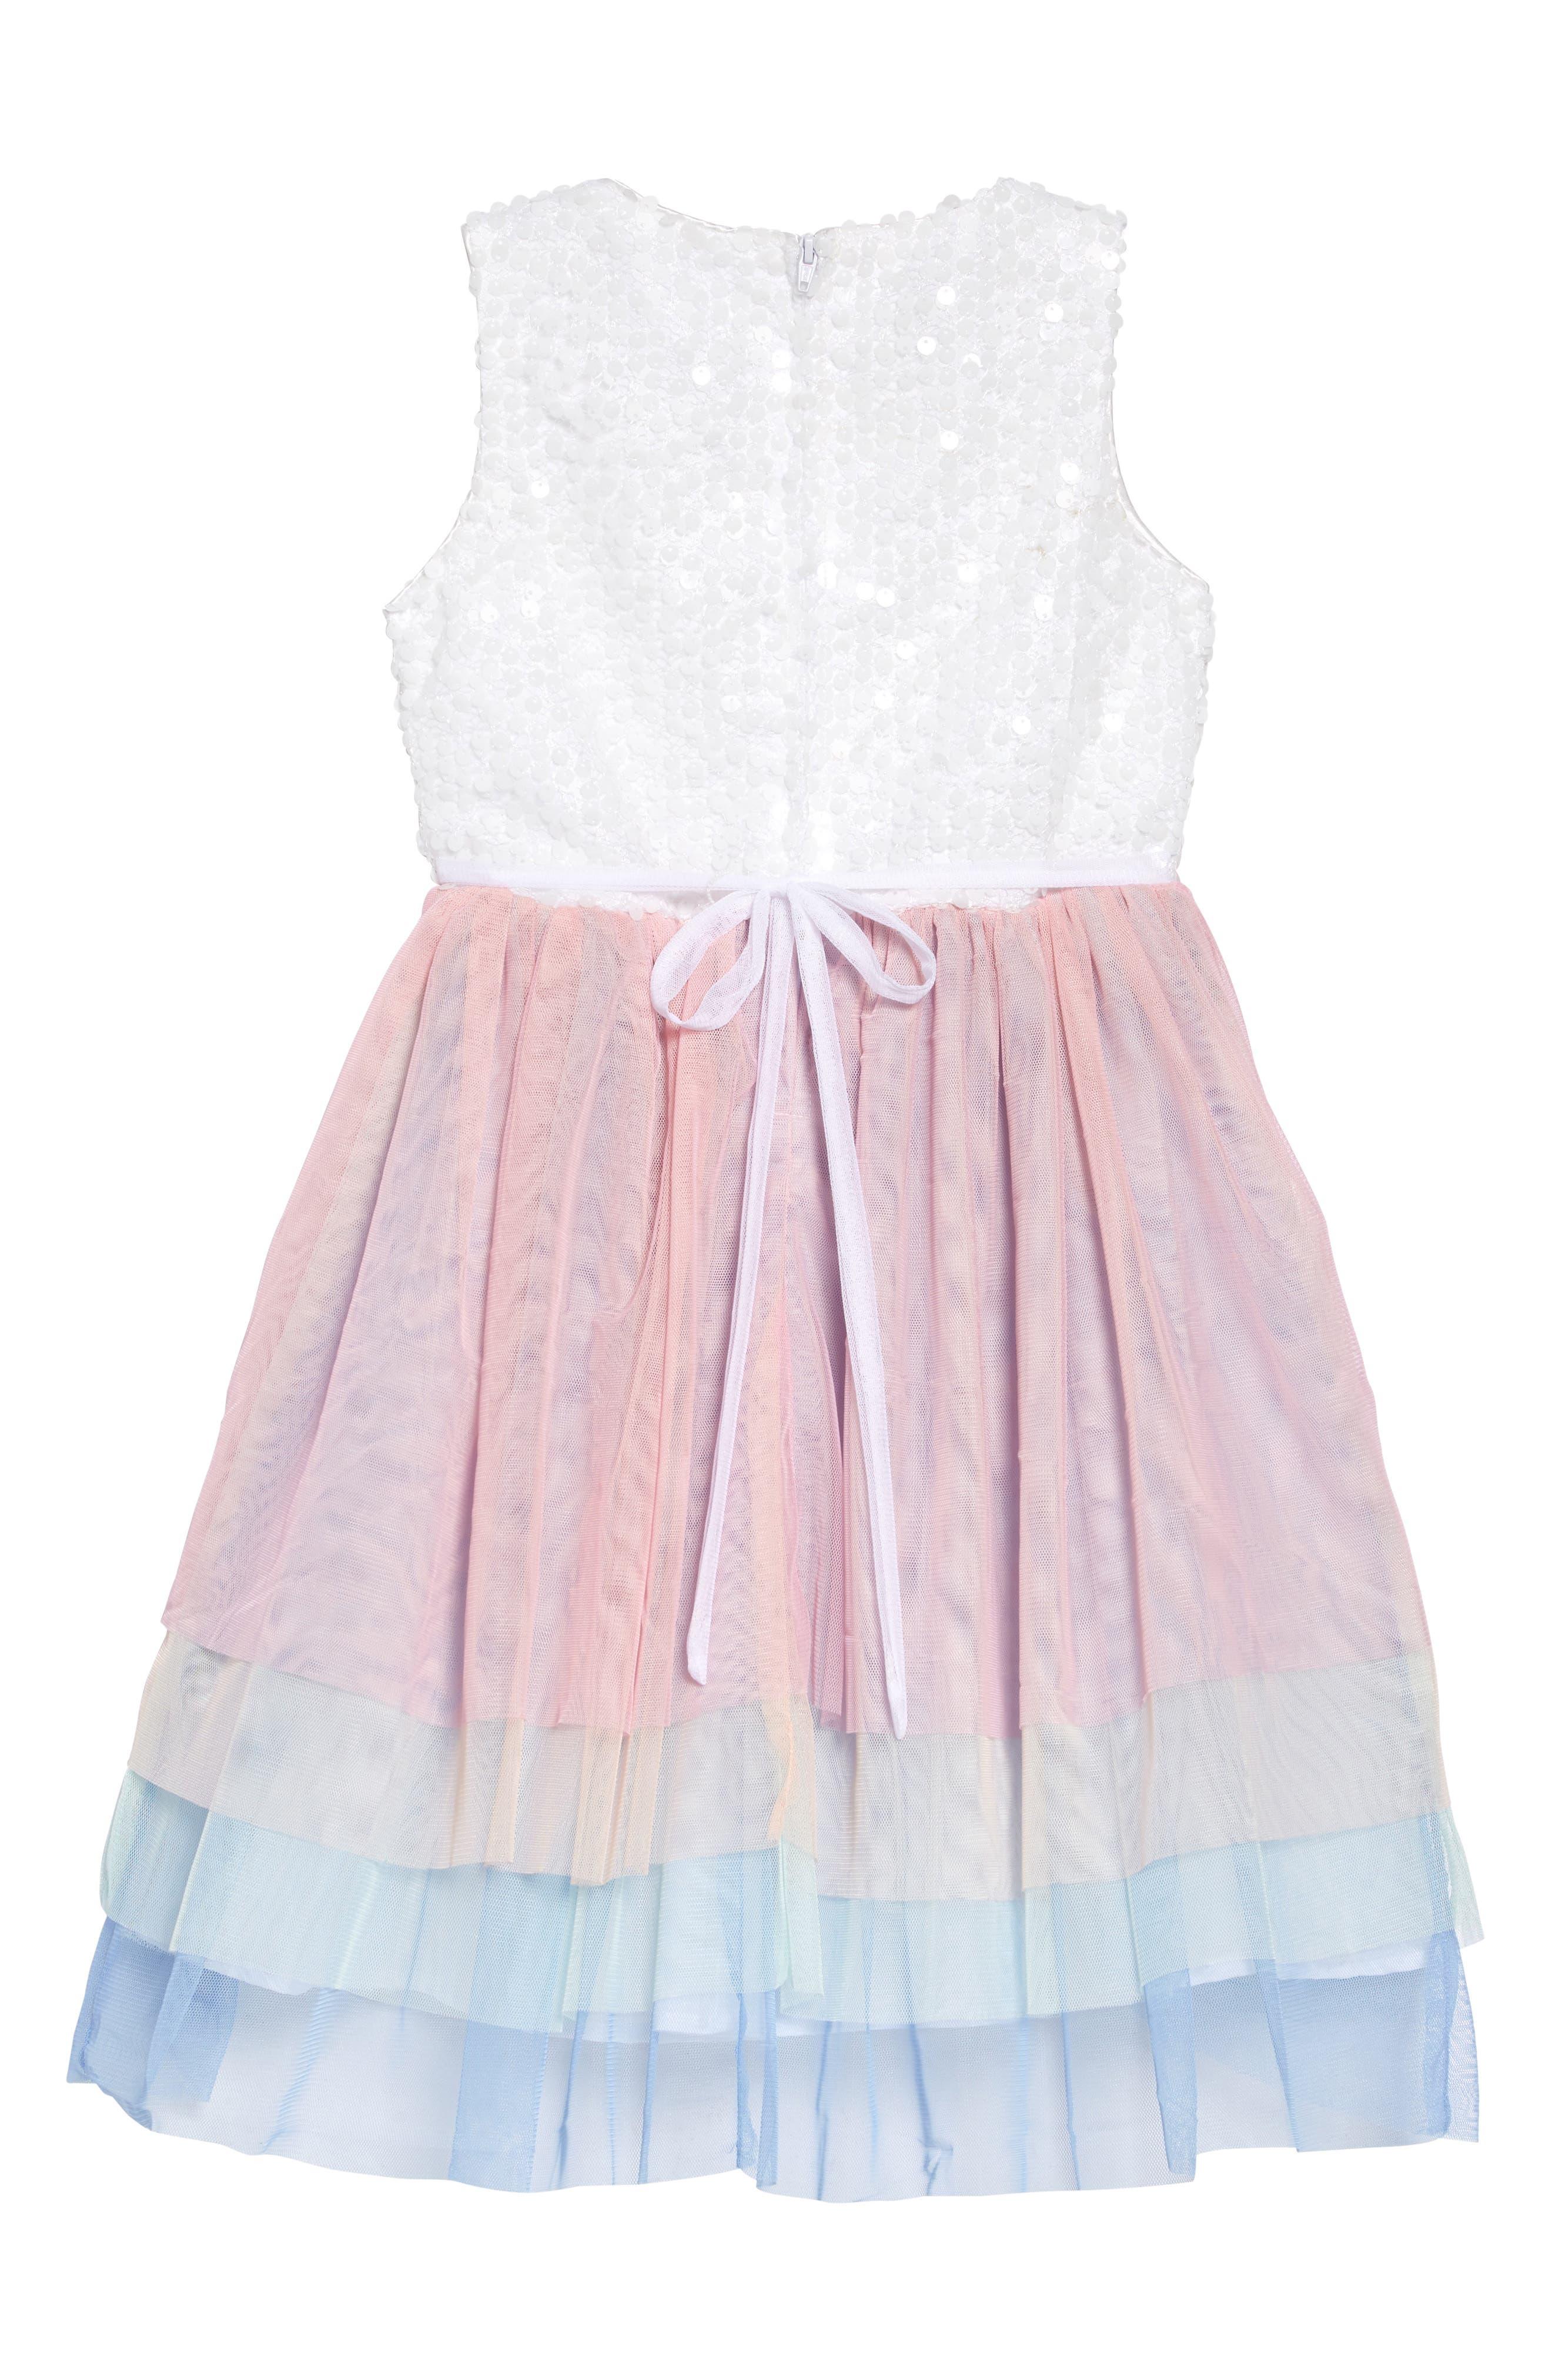 LITTLE ANGELS, Sequin & Tulle Ballerina Dress, Alternate thumbnail 2, color, PINK